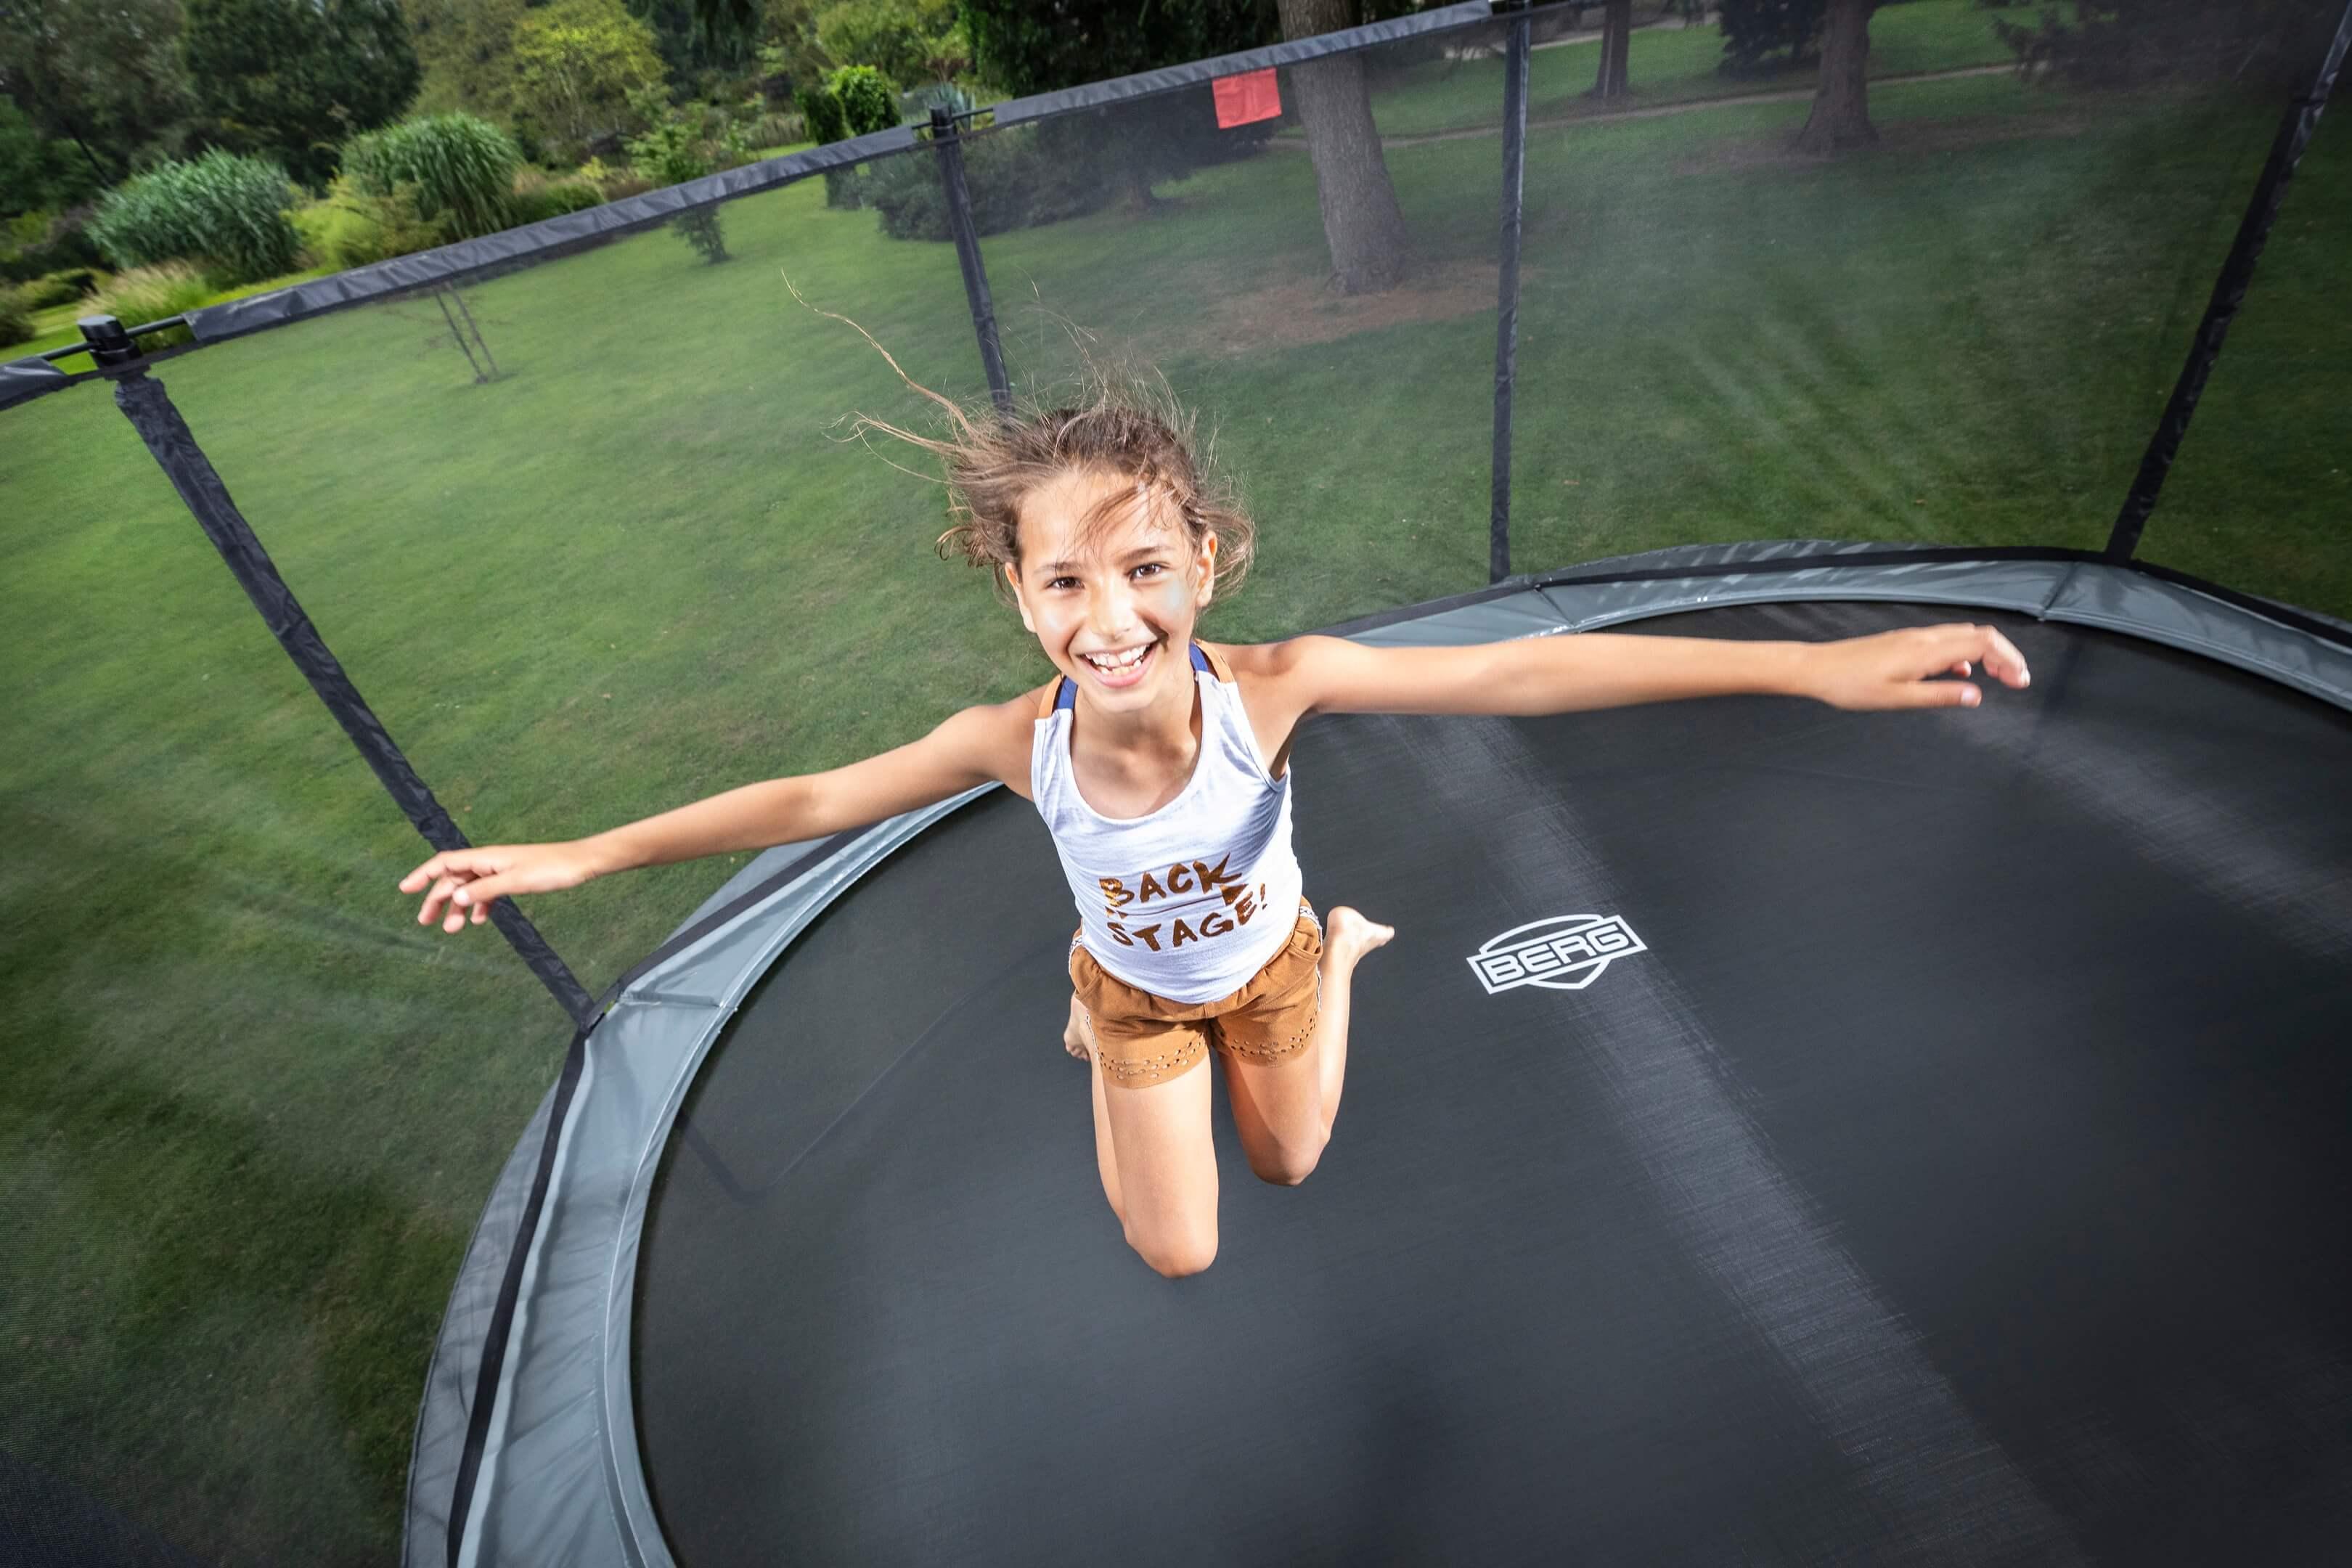 Jurjen Poeles fotografie Berg Toys trampoline sport speelgoed actief buiten lifestyle outdoor